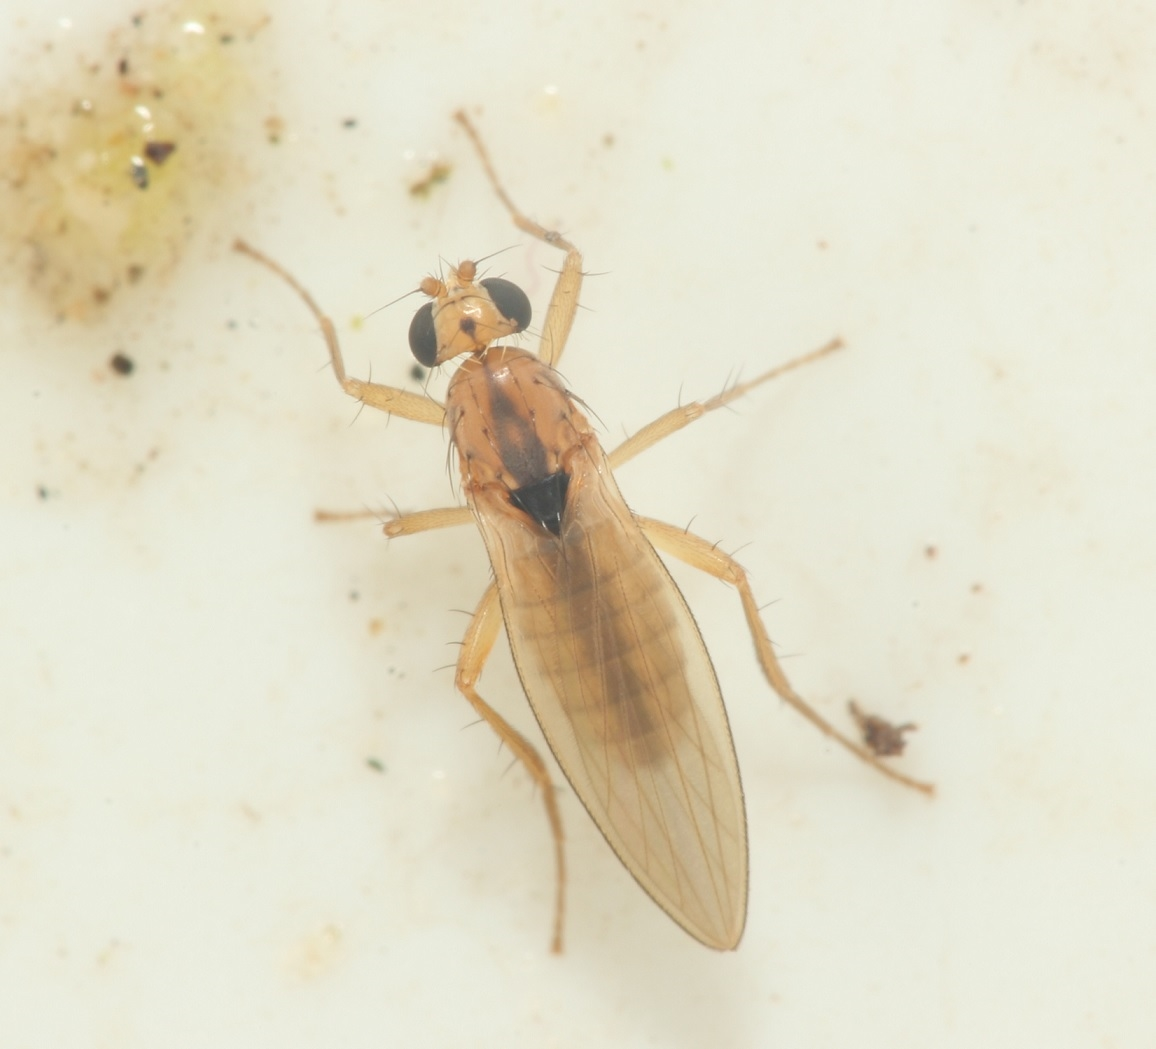 Lonchoptera scutellata